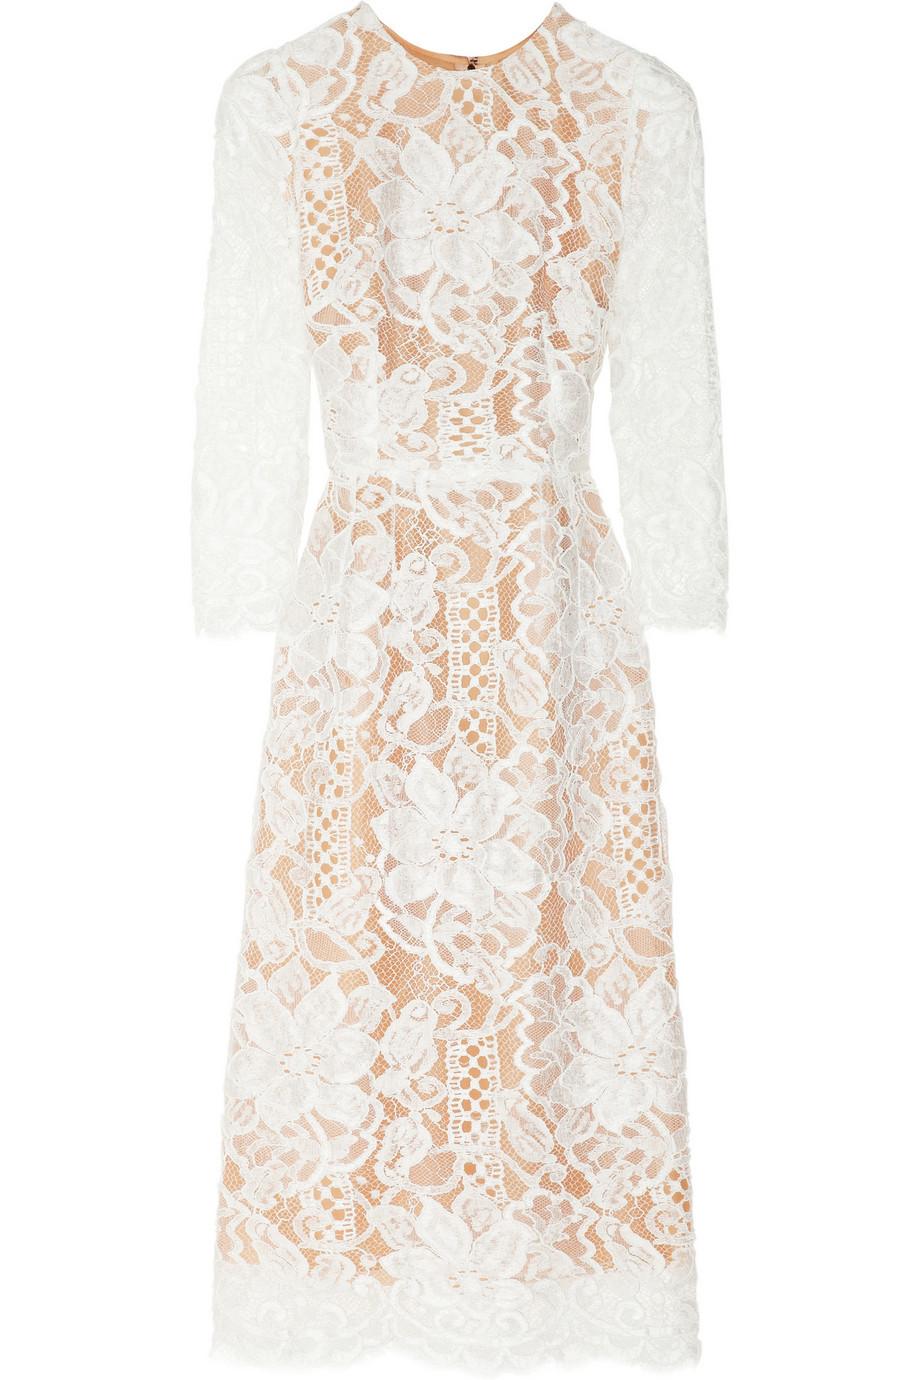 Dolce   Gabbana Lace and Silk-organza Midi Dress in White - Lyst c05b236177c